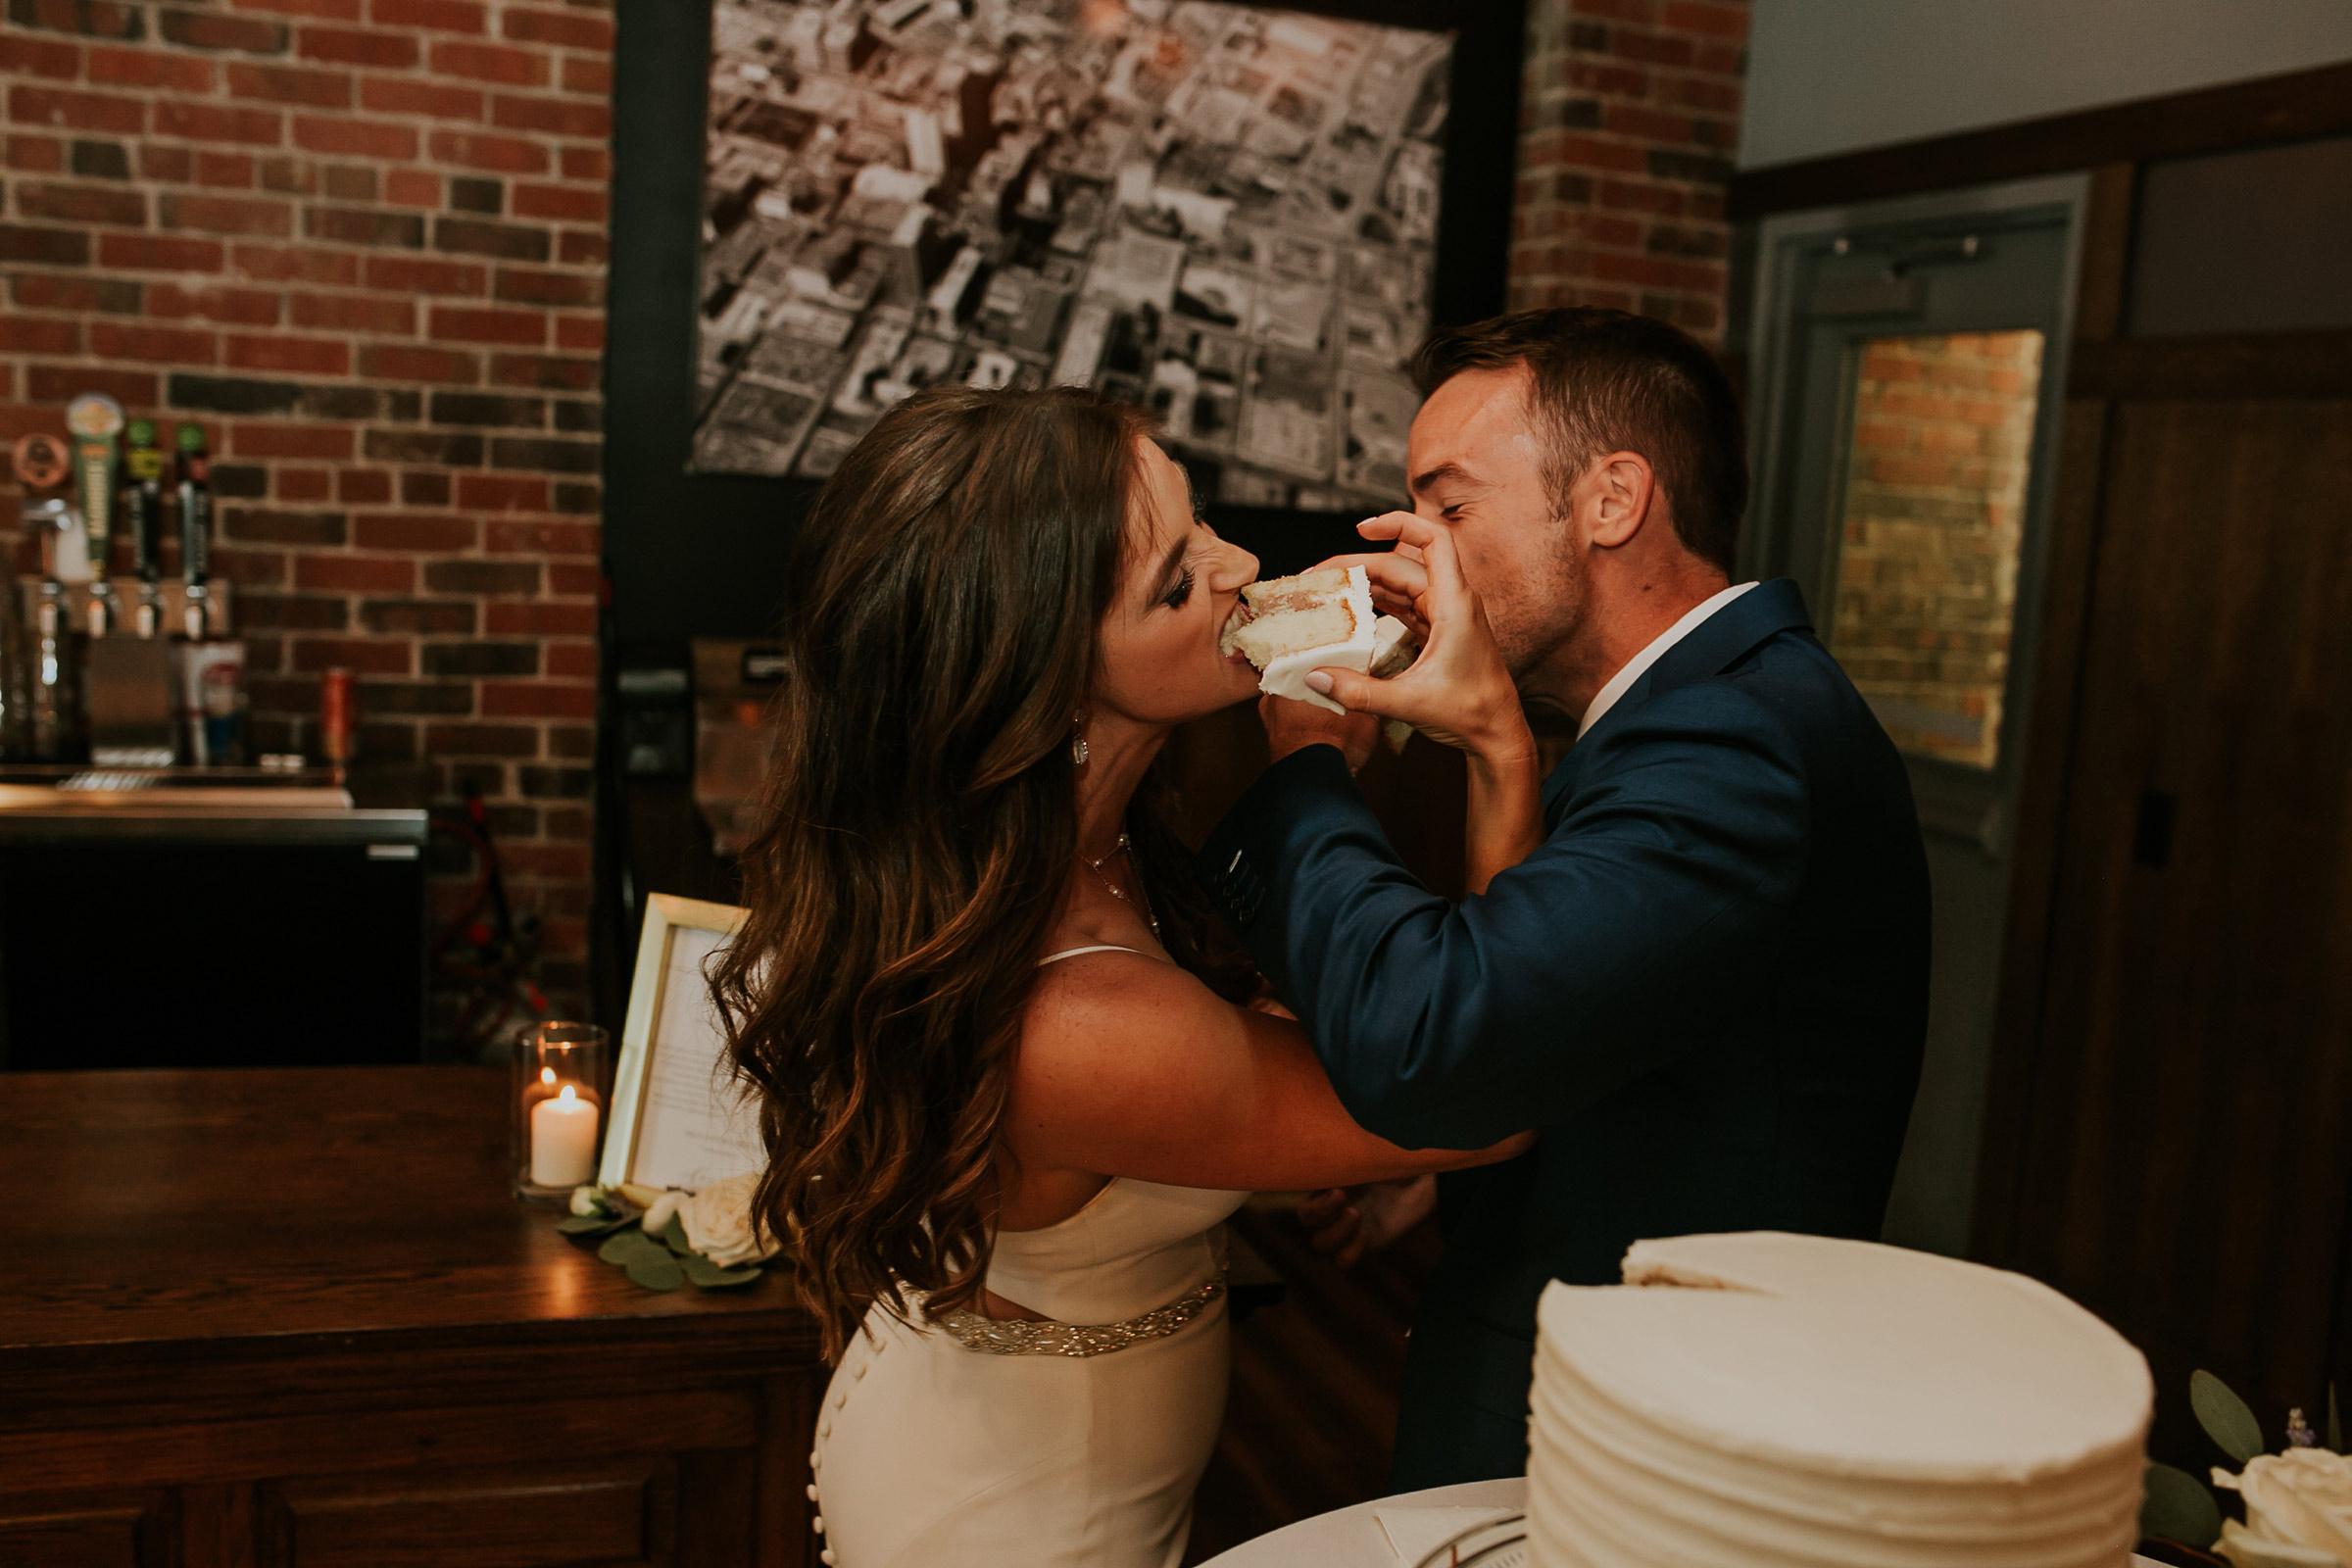 mr-mrs-hull-couple-eating-cake-taproom-desmoines-iowa-raelyn-ramey-photography-553.jpg